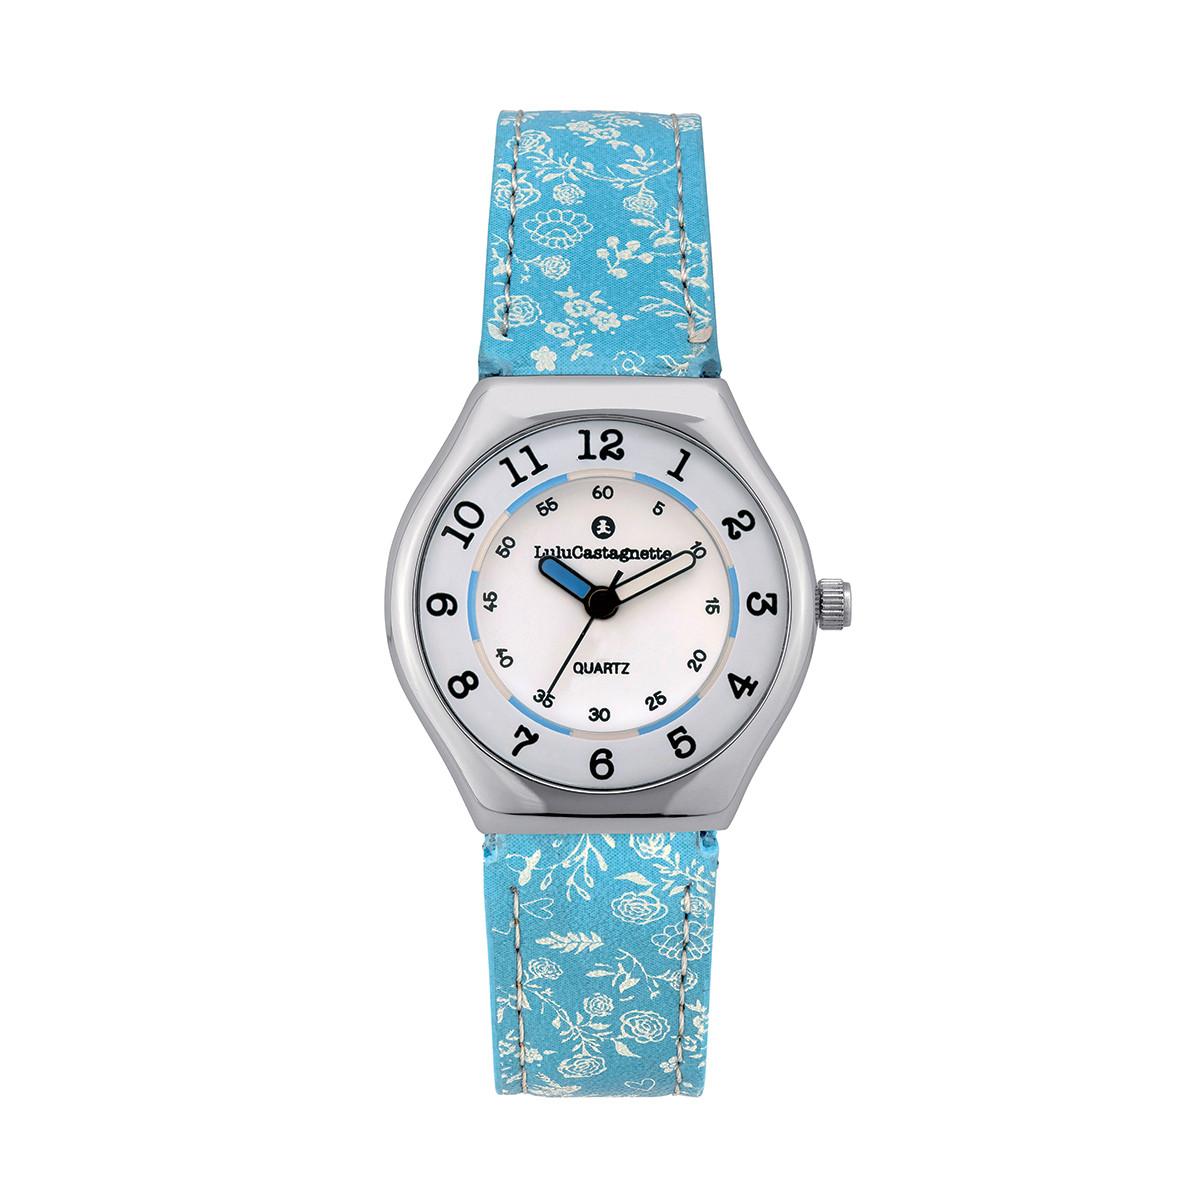 Montre Fille LuluCastagnette Mini Star  bracelet bleu motif floral - 38876